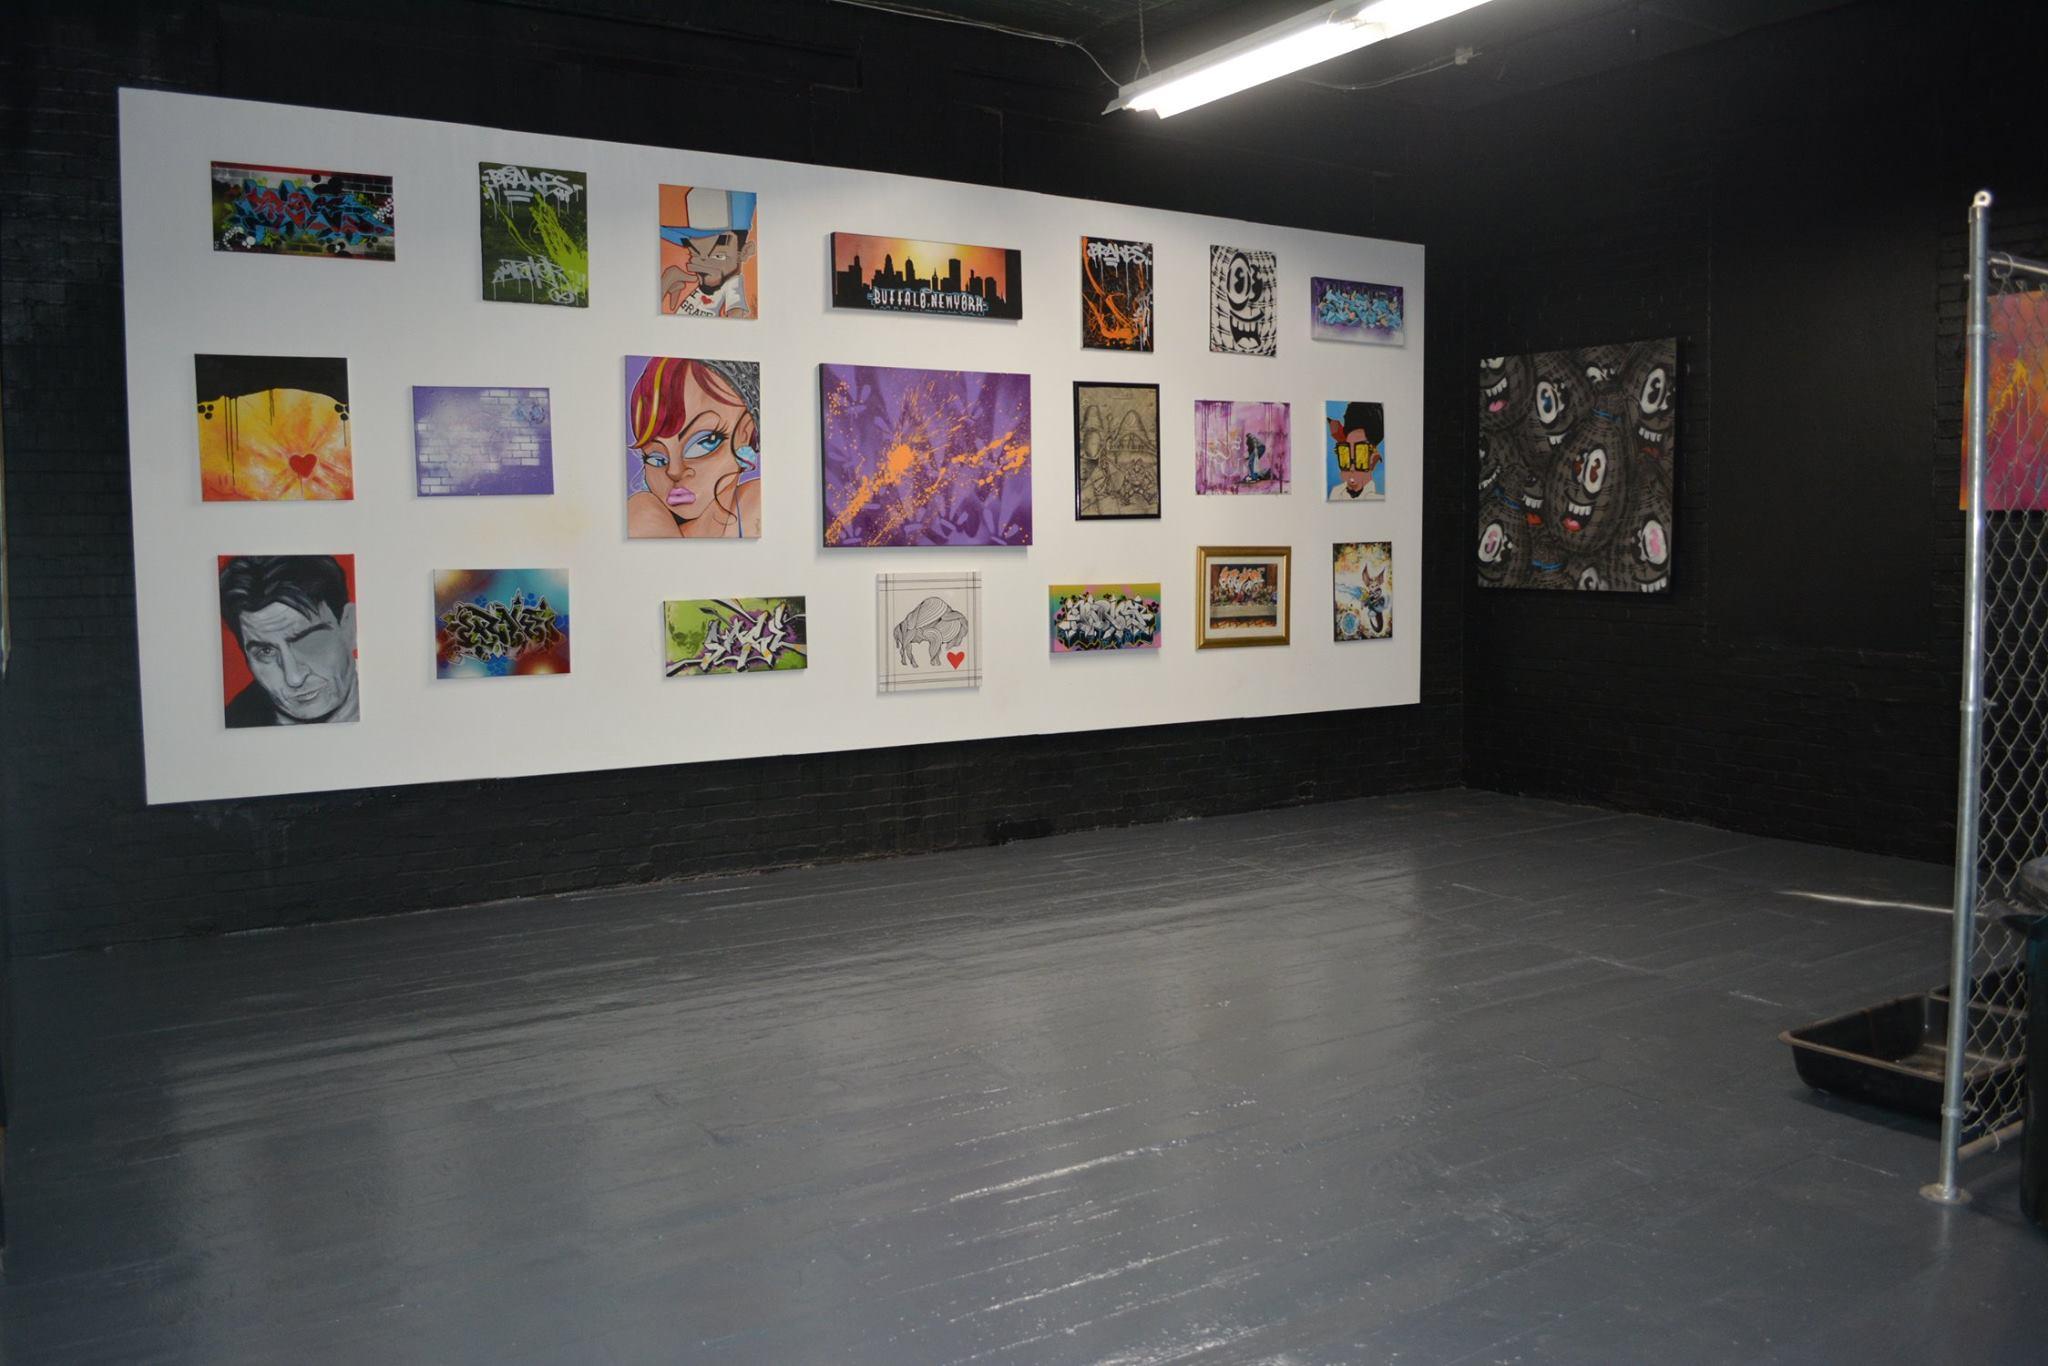 Daddy's garage buffalo art gallery